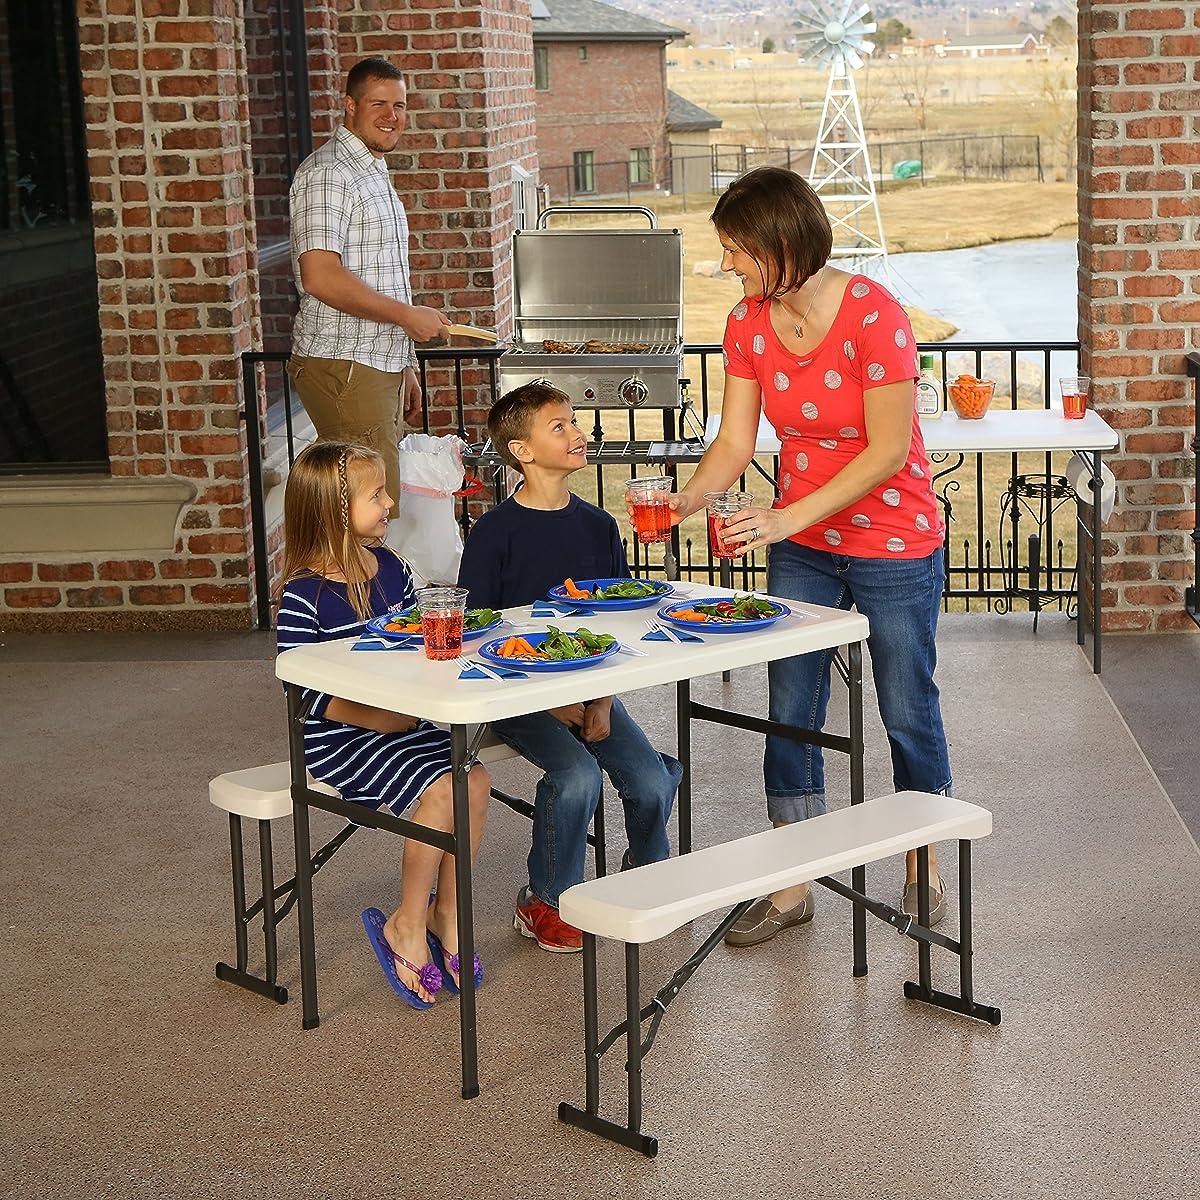 Lifetime 80373 Portable Folding Picnic Table and Bench Set, Almond